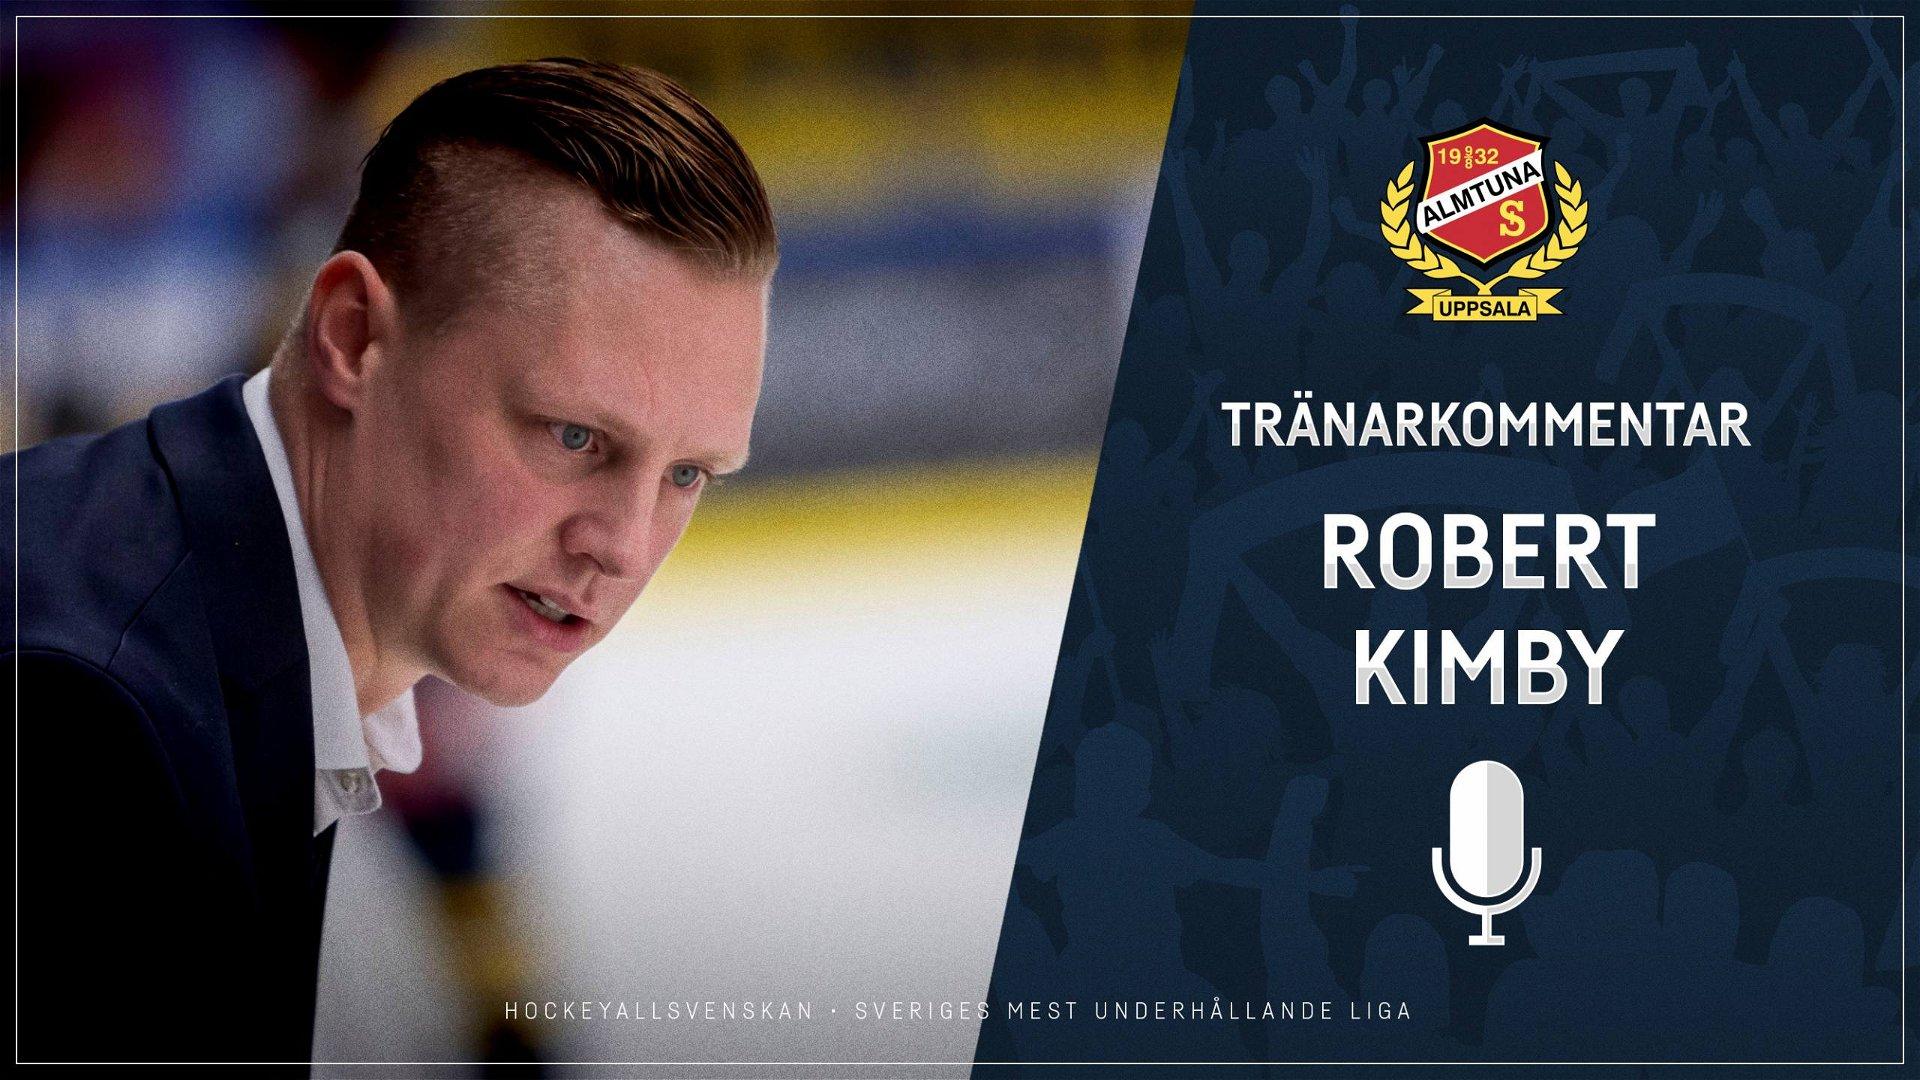 2021-03-12 Segerintervju: Robert Kimby